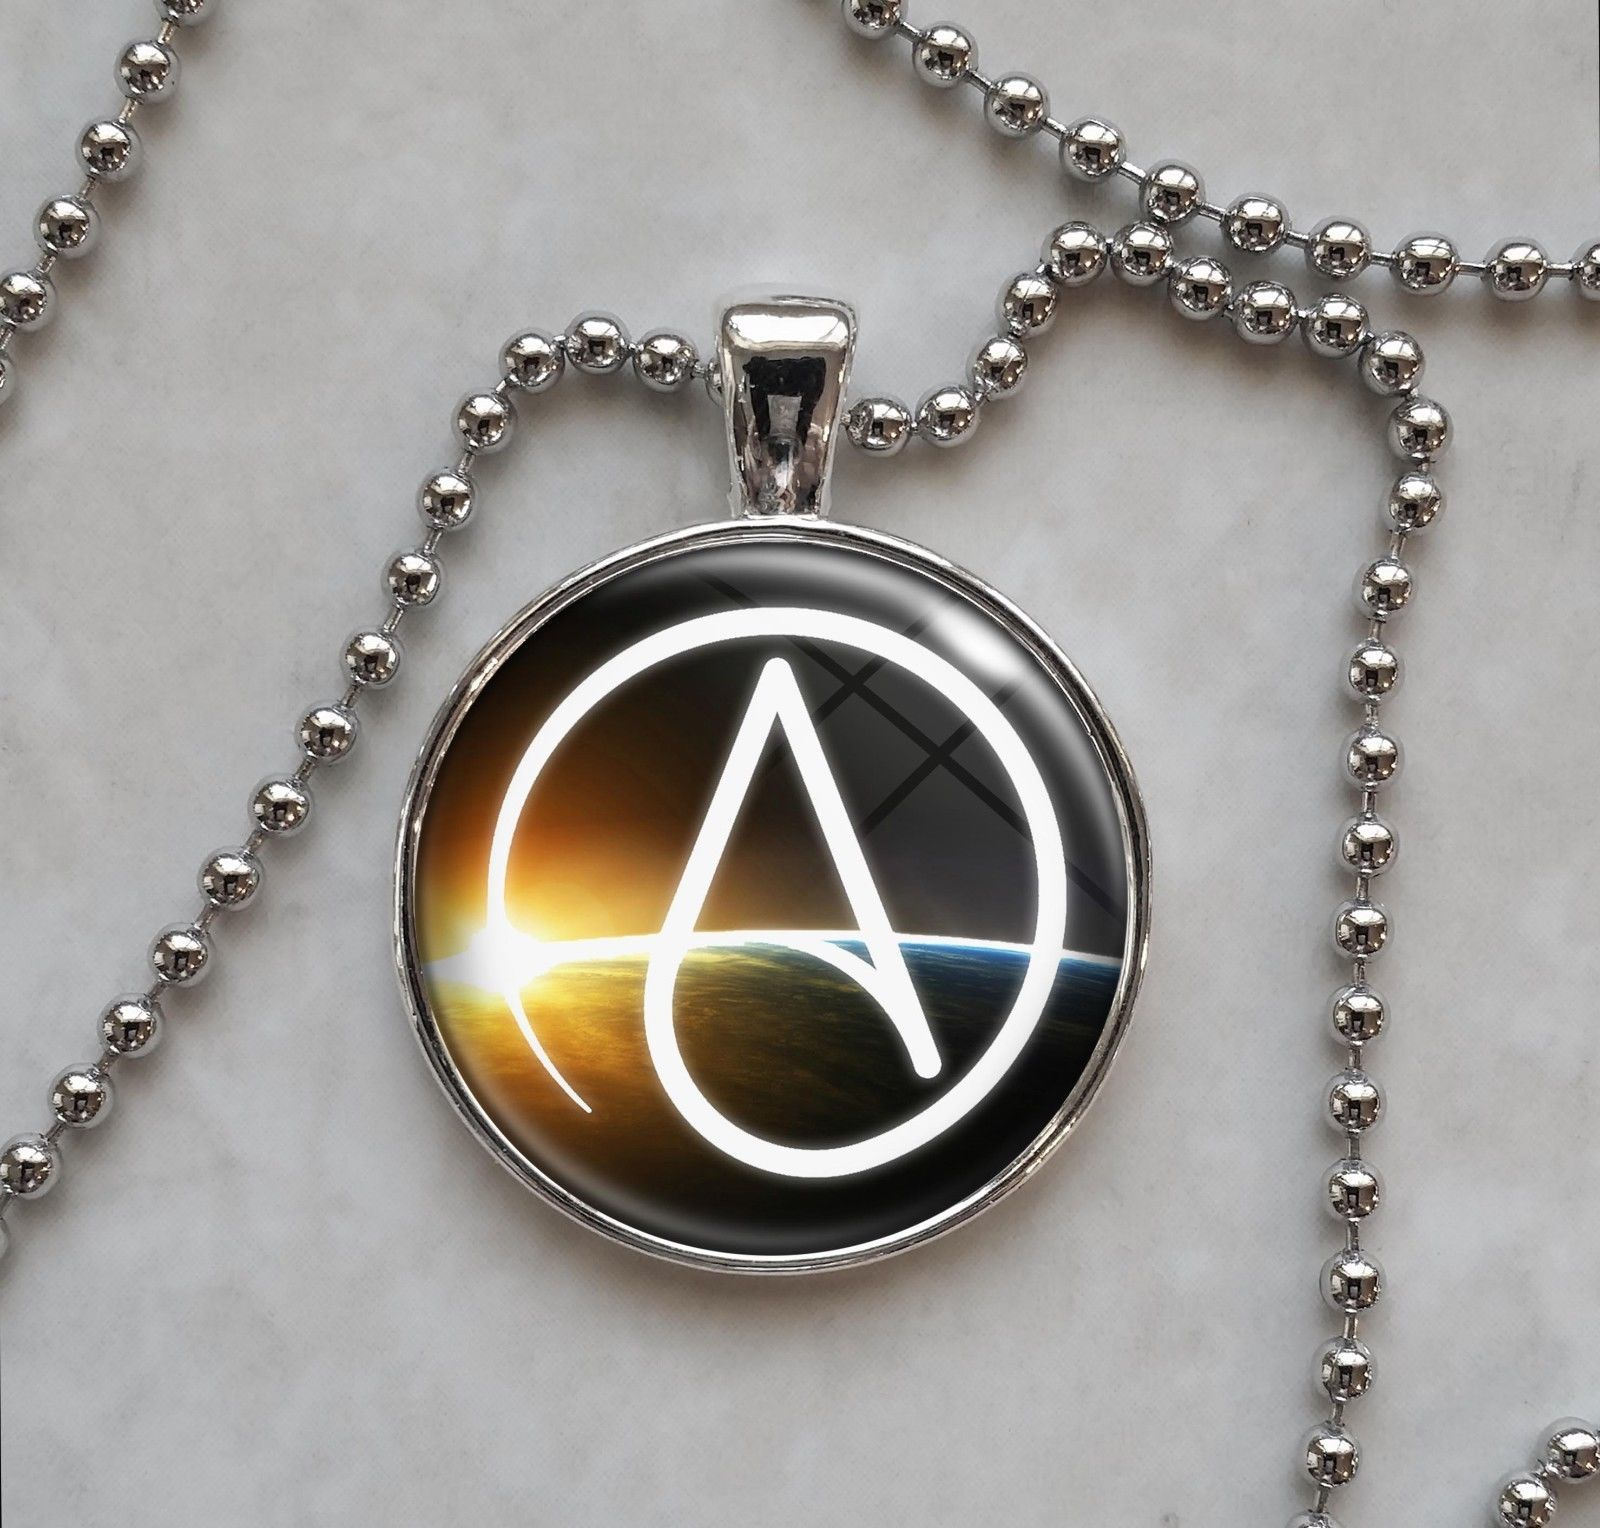 Atheist Symbol Atheism Agnostic Free Thinker And 50 Similar Items